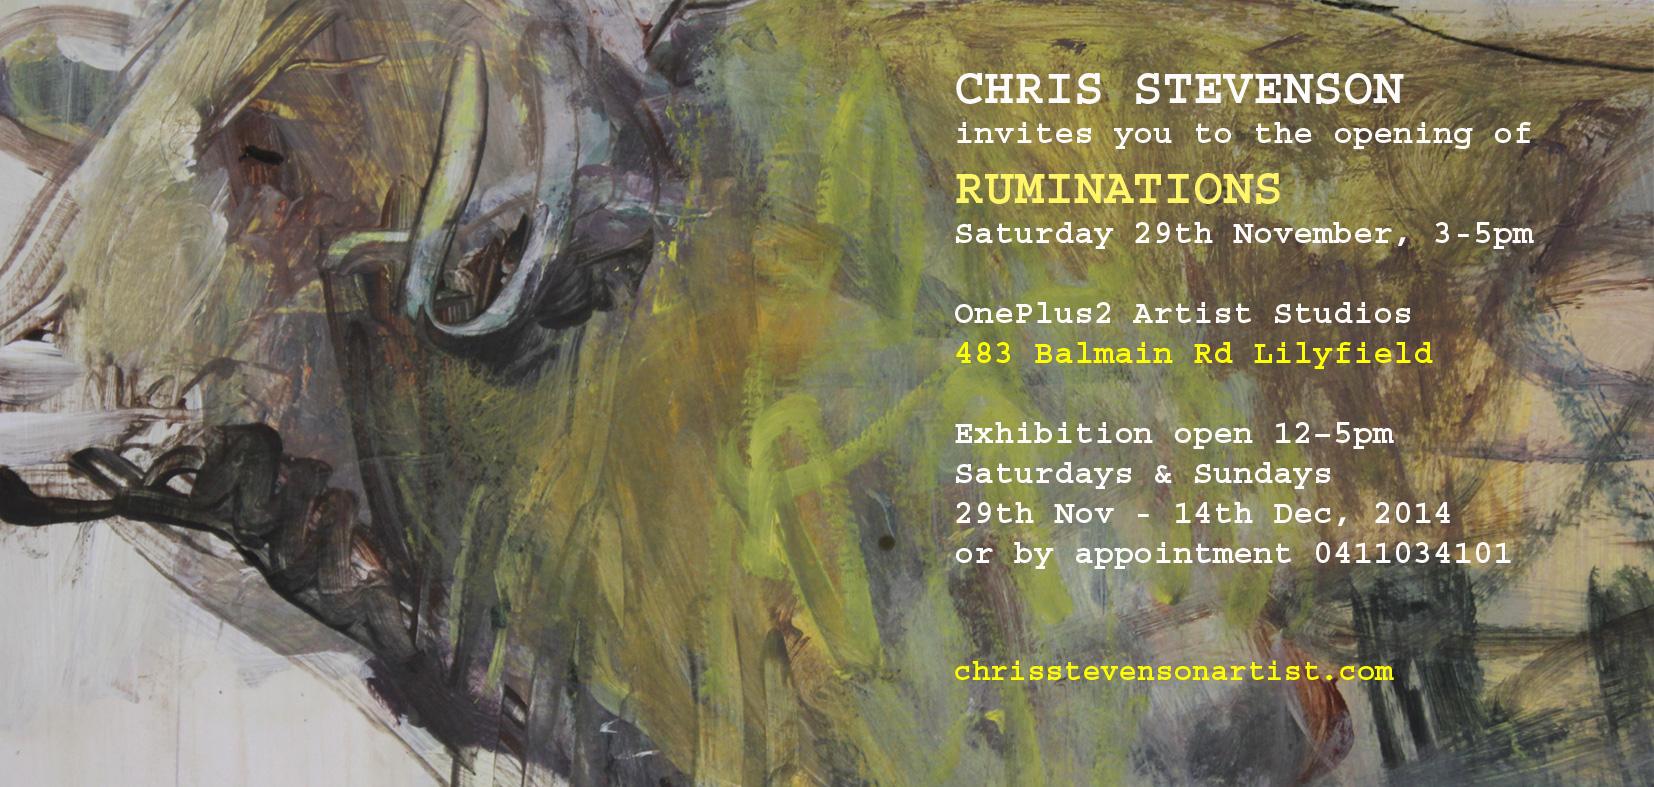 Ruminations Invitation